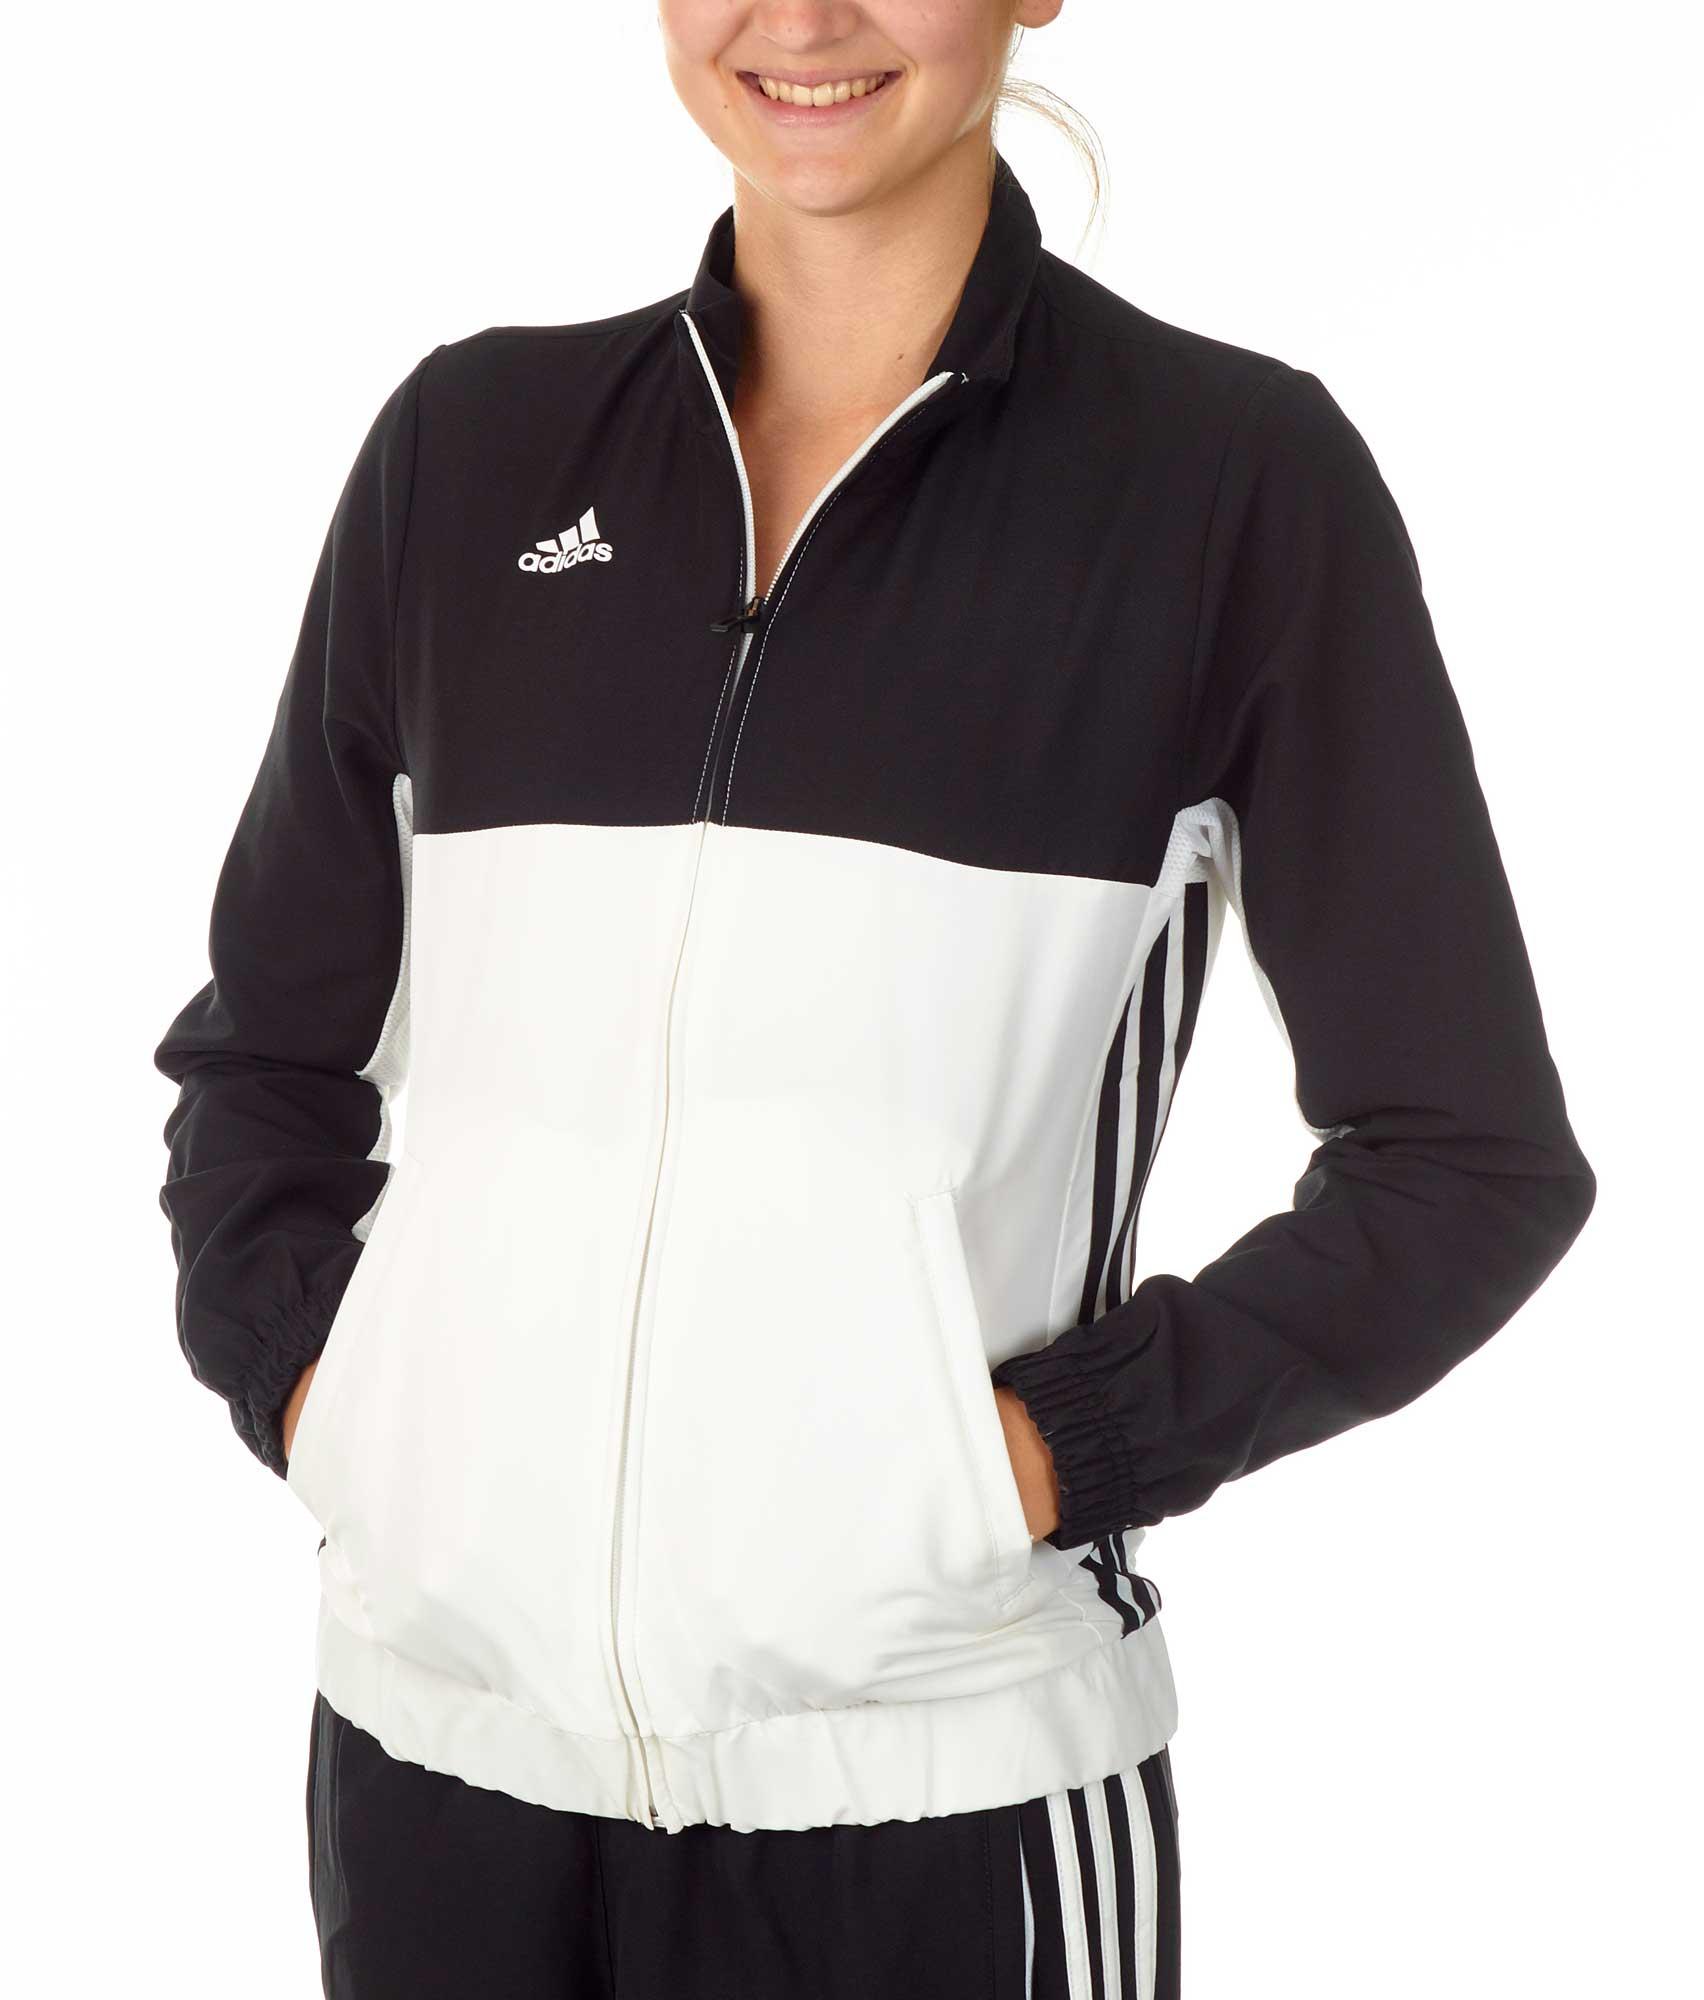 adidas T16 Team Jacket Damen schwarzweiß, AJ5326